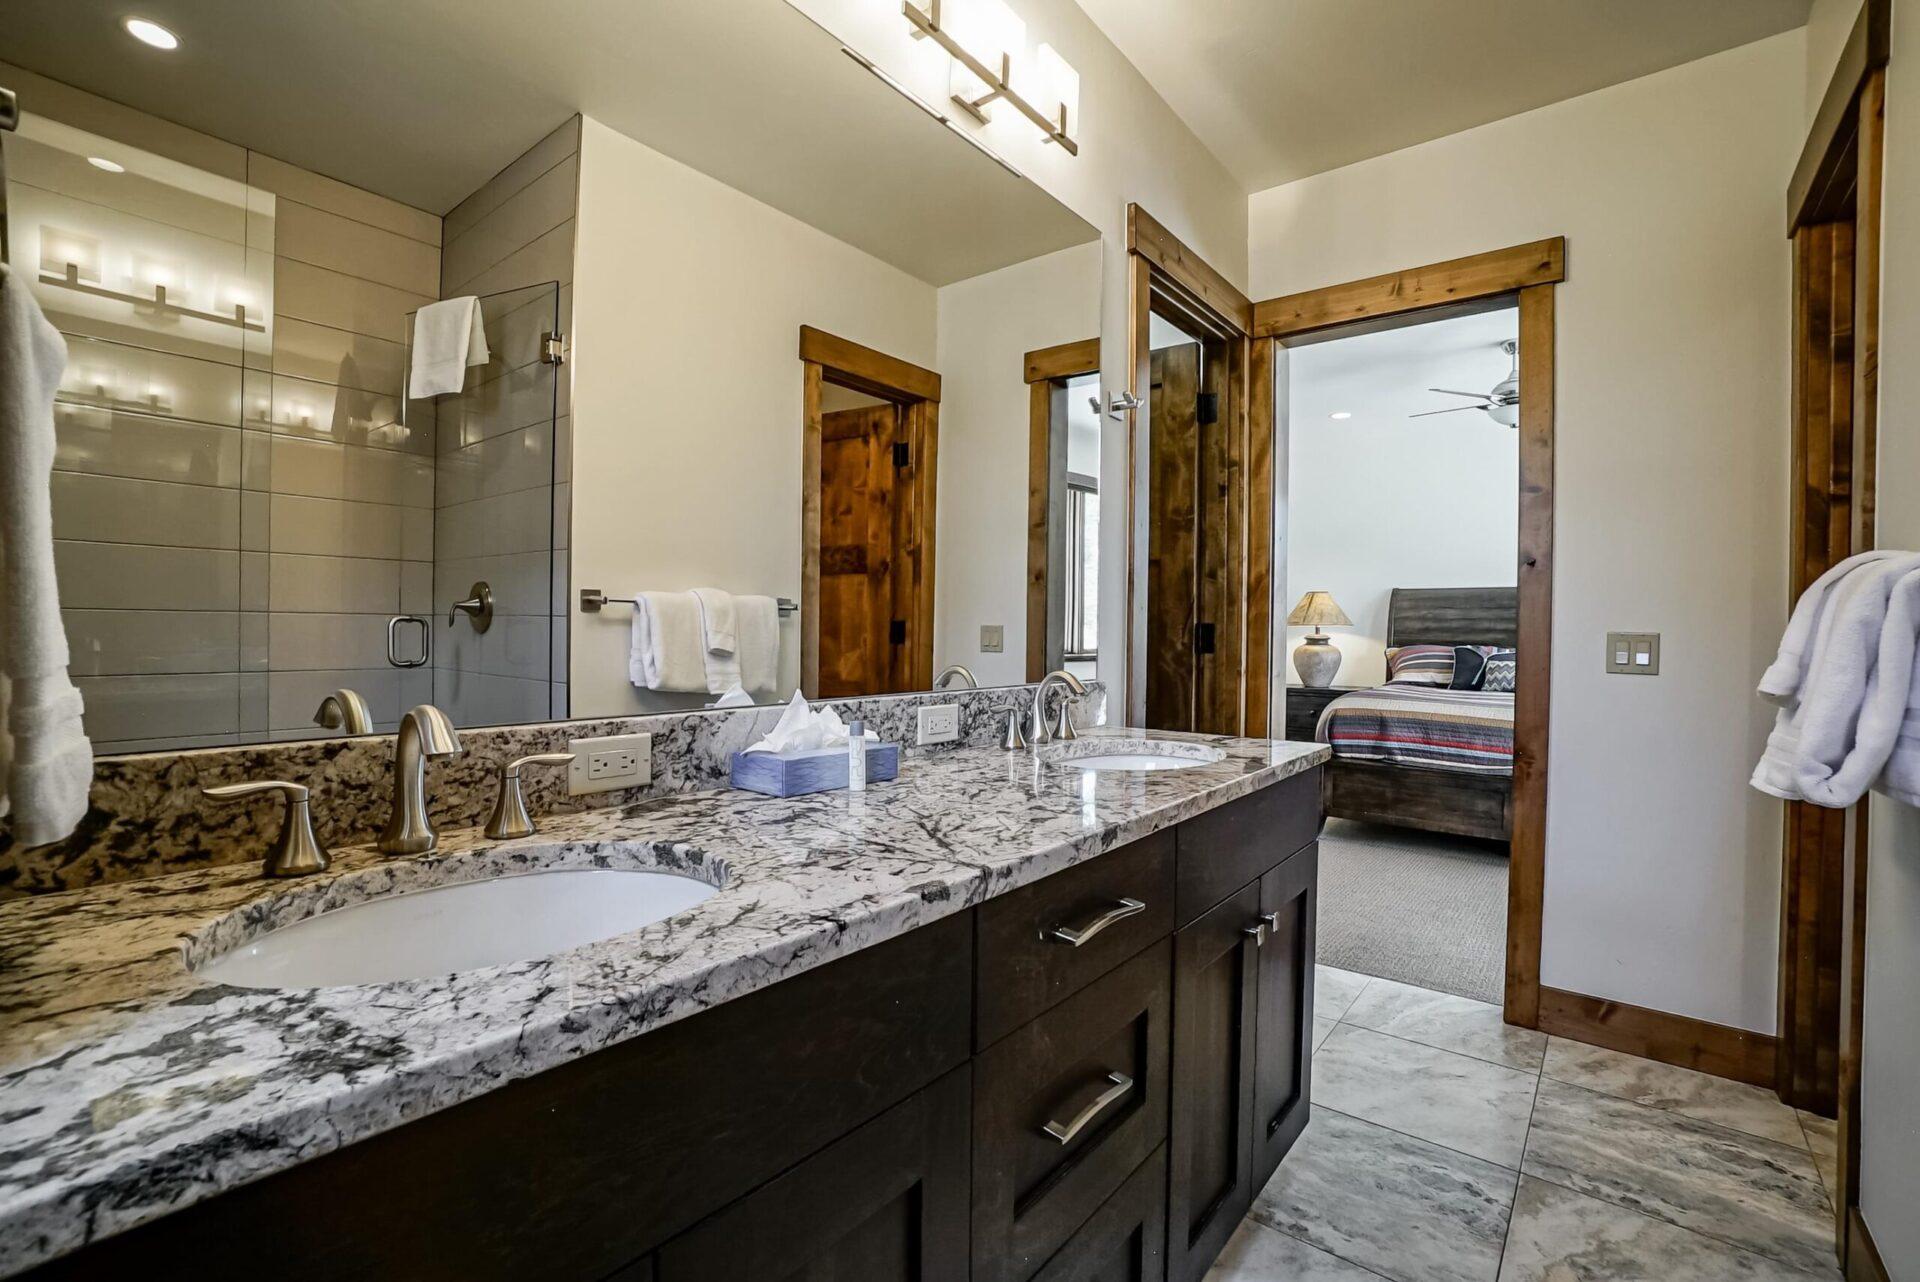 44.Downstairs_Bathroom_2